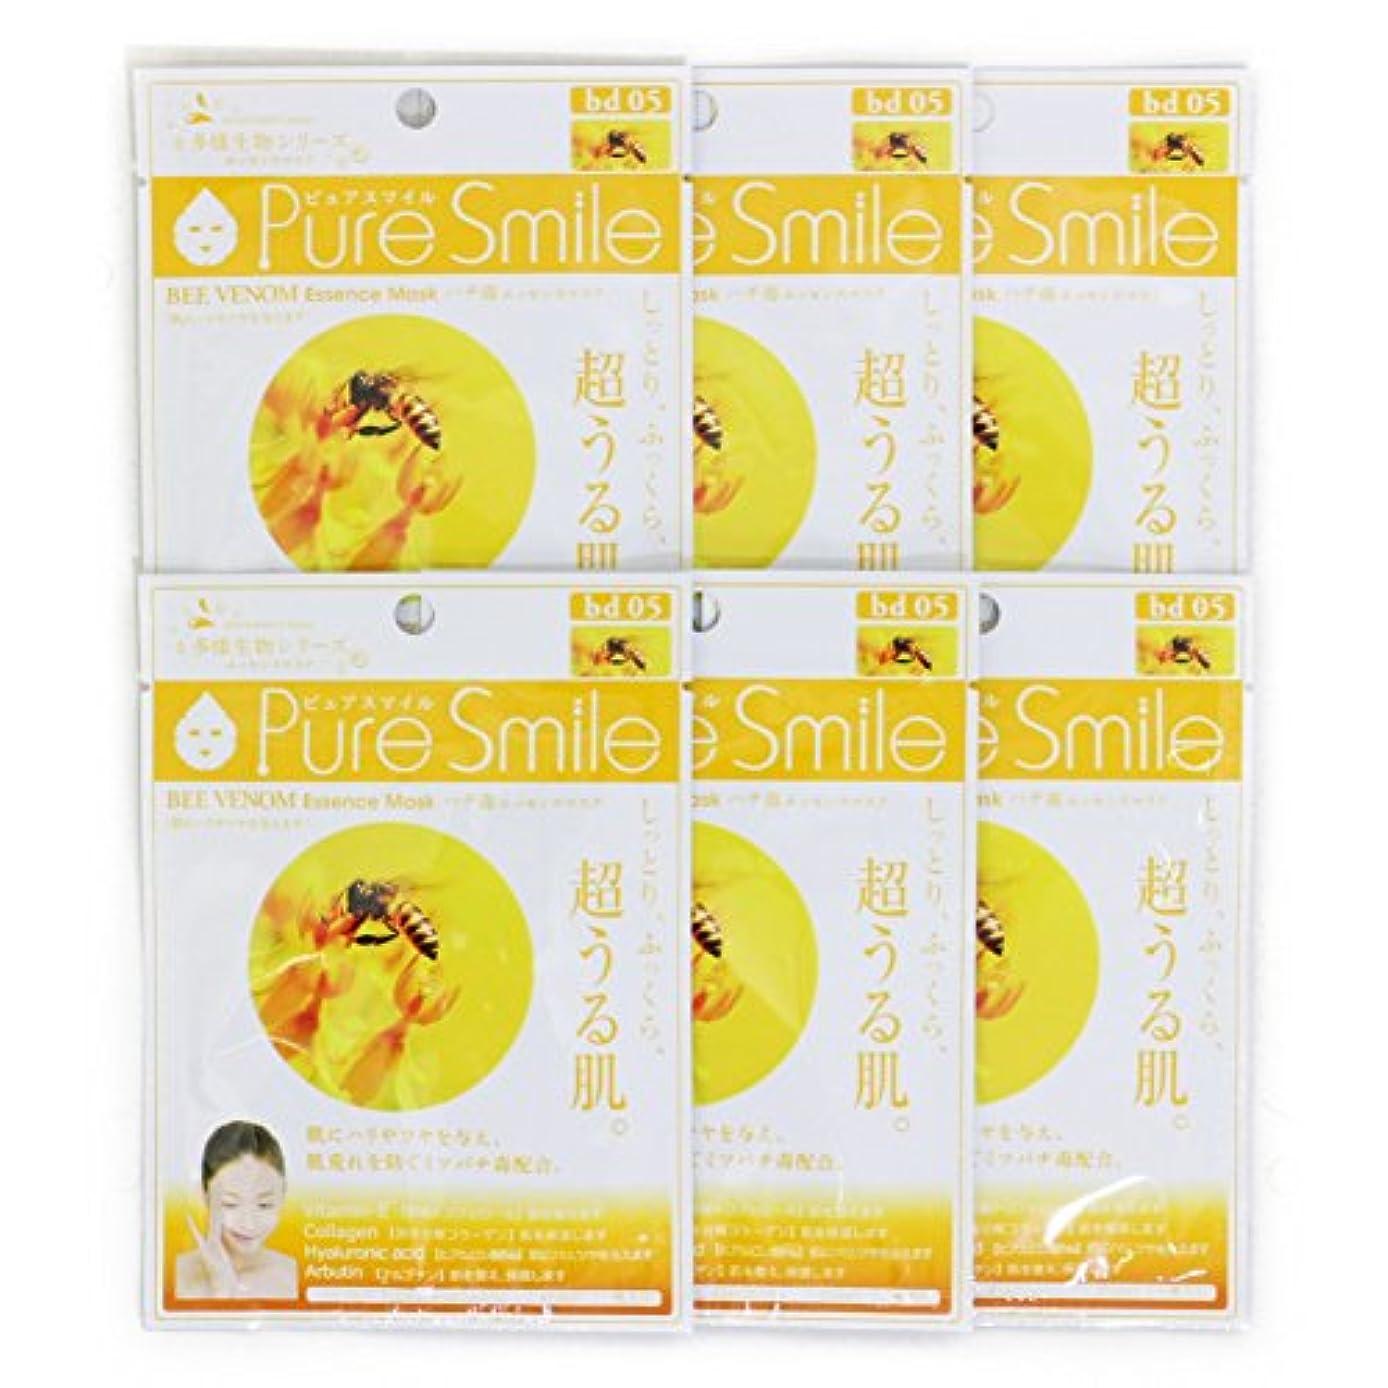 Pure Smile ピュアスマイル 多様生物エッセンスマスク ハチ毒 6枚セット